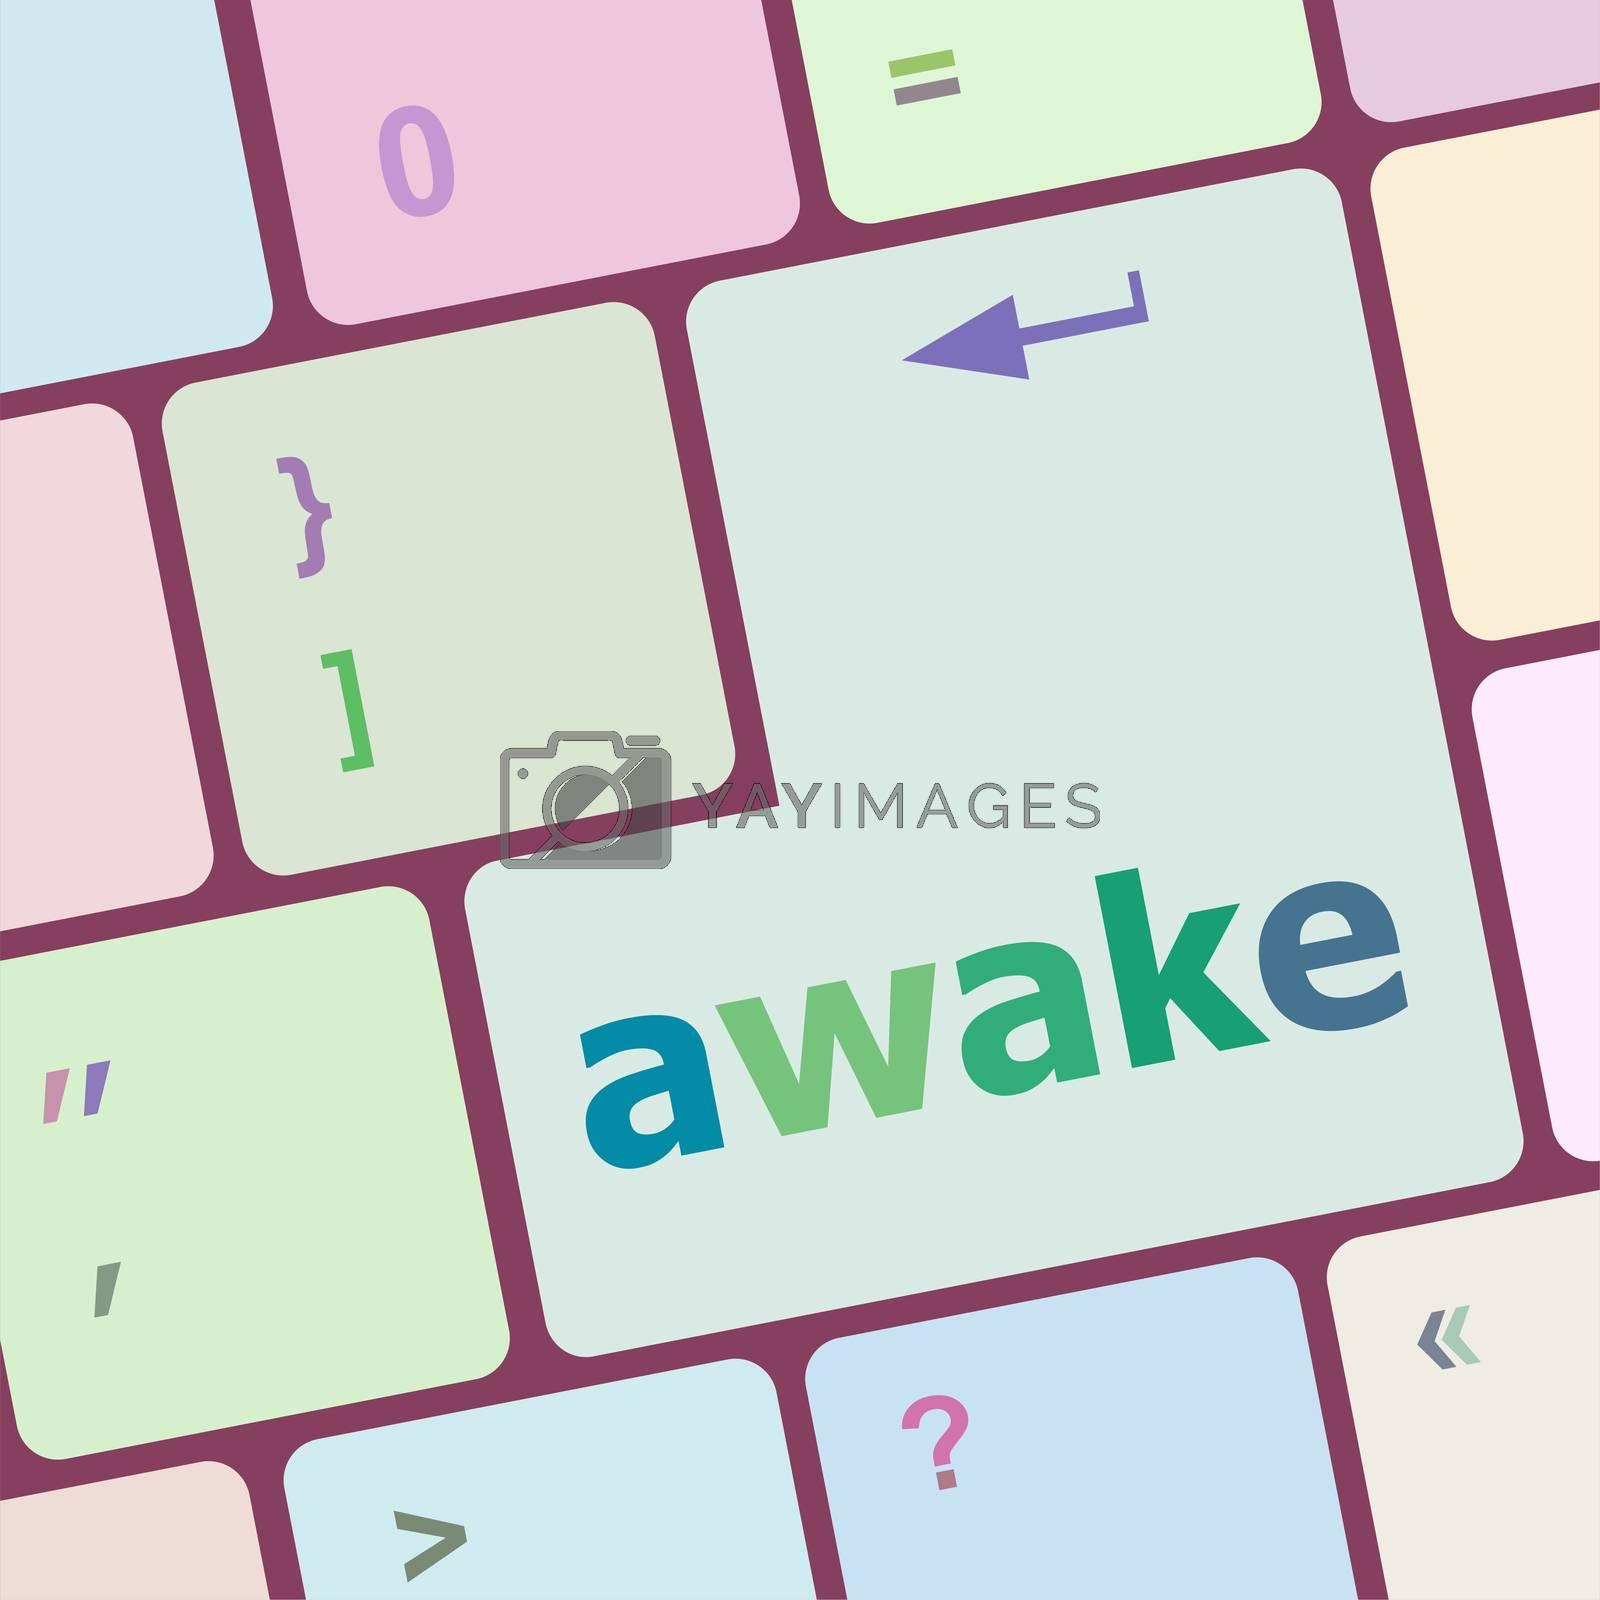 awake word on keyboard key, notebook computer